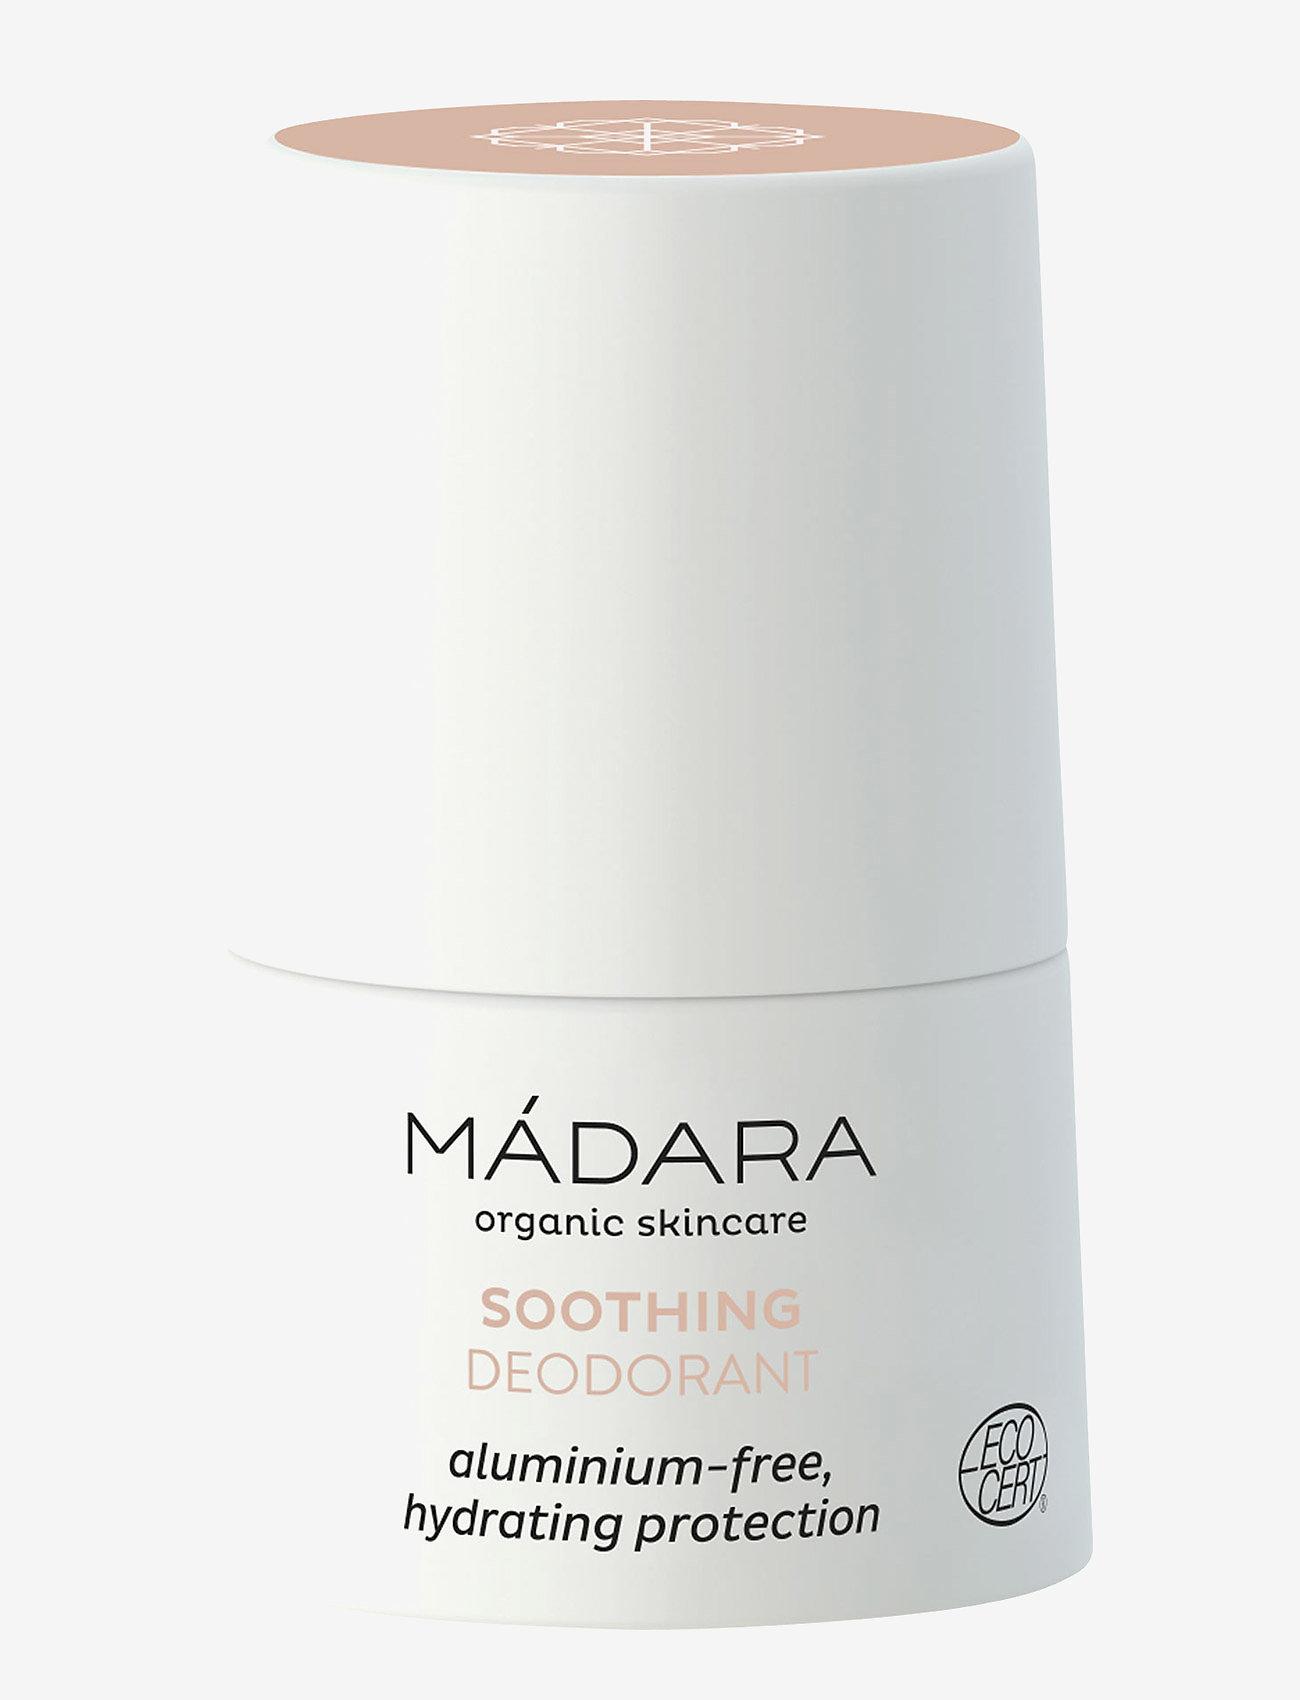 MÁDARA - Soothing Deodorant, 50 ml - clear - 0